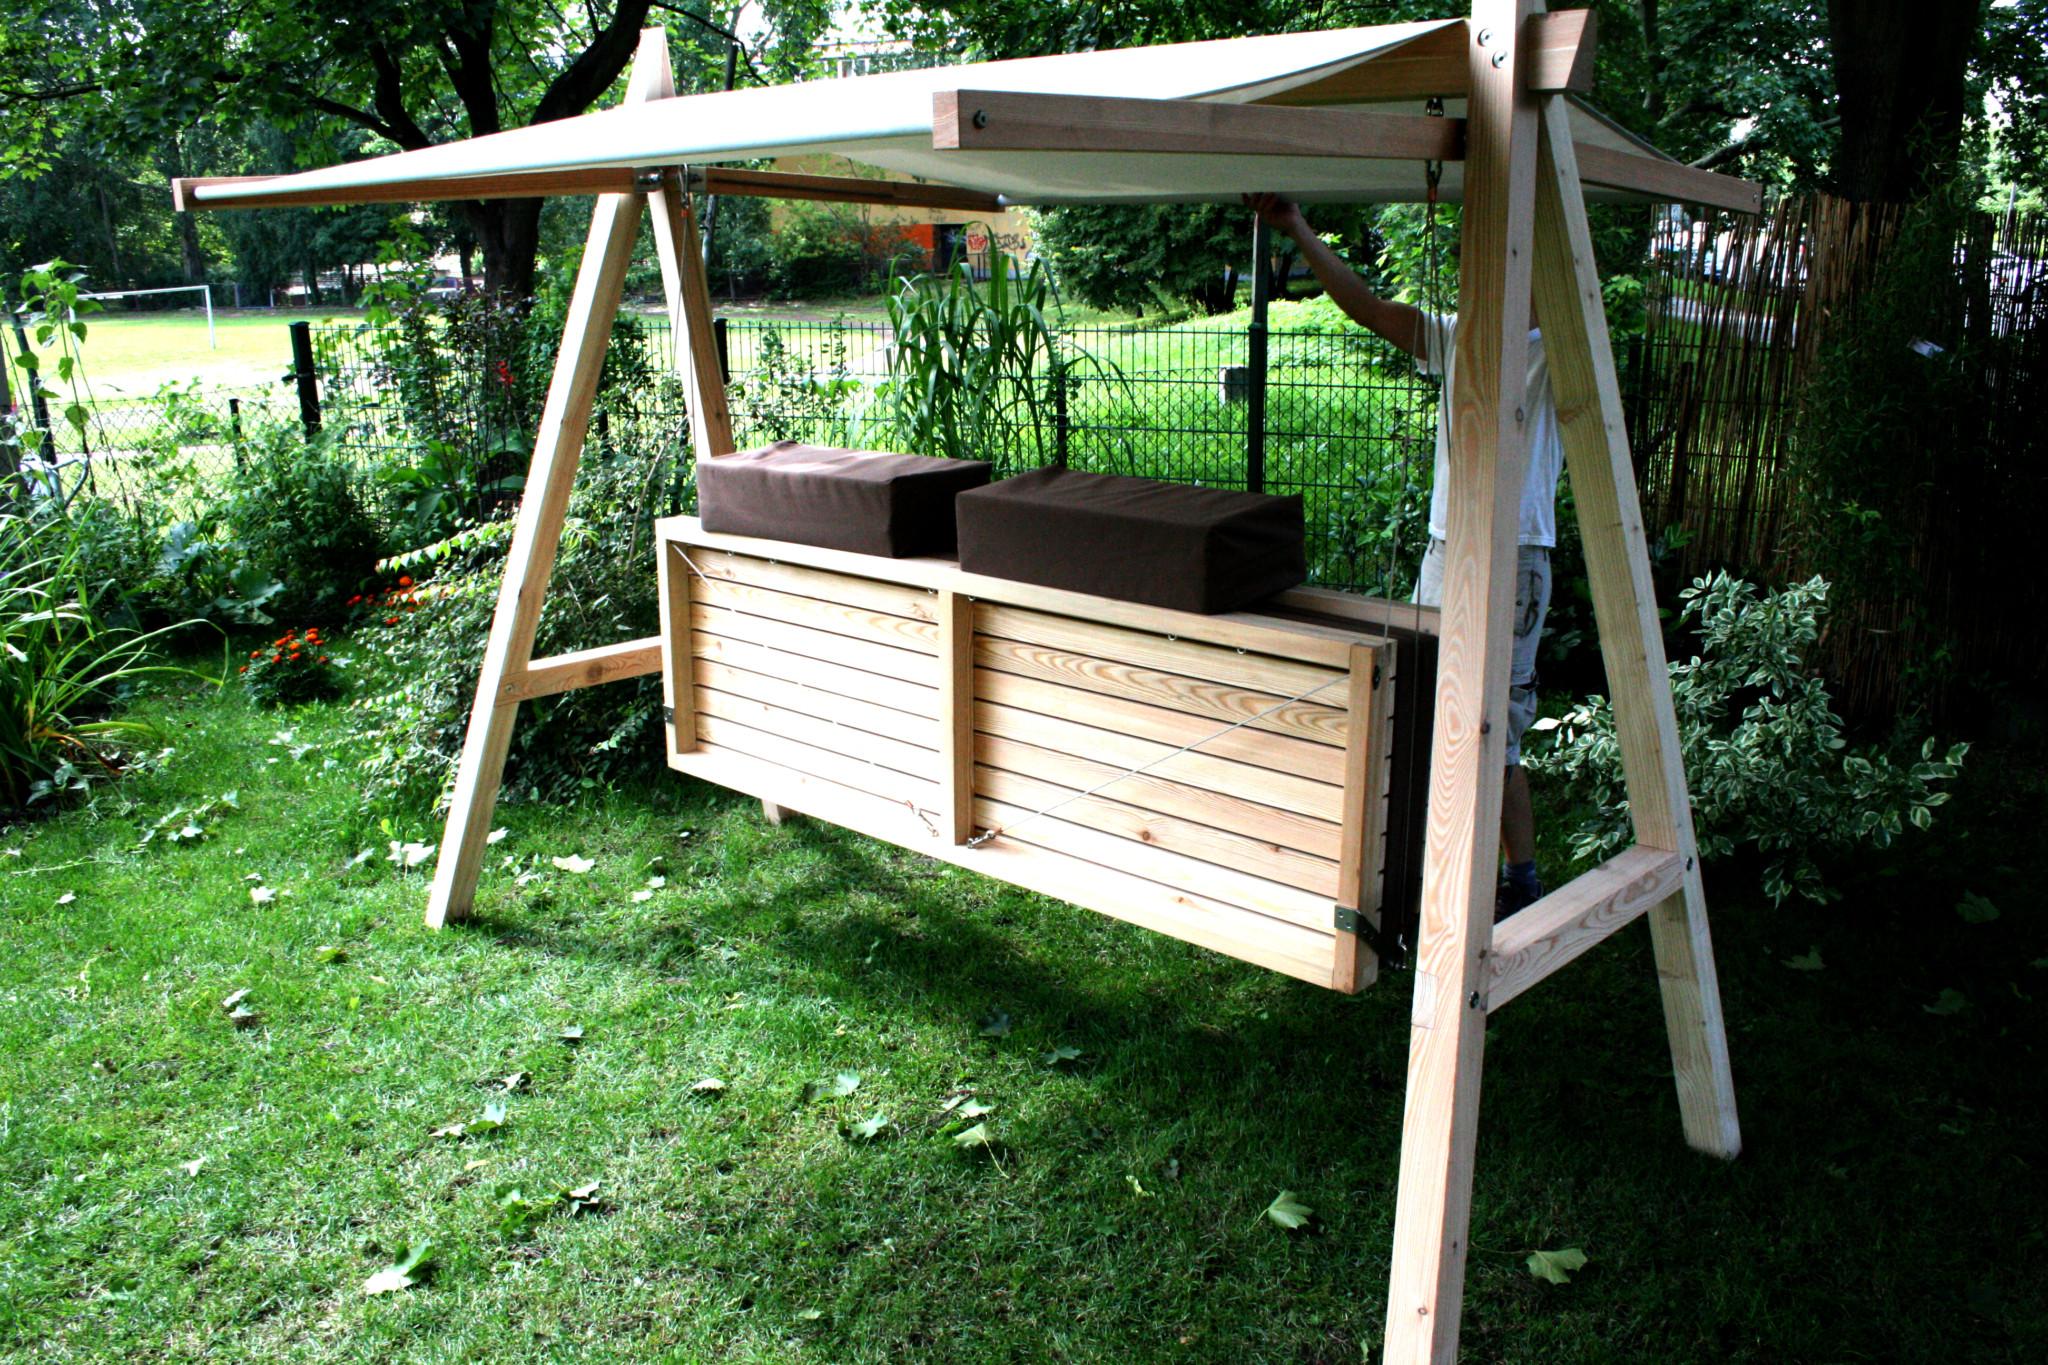 hollywoodschaukel pool22. Black Bedroom Furniture Sets. Home Design Ideas